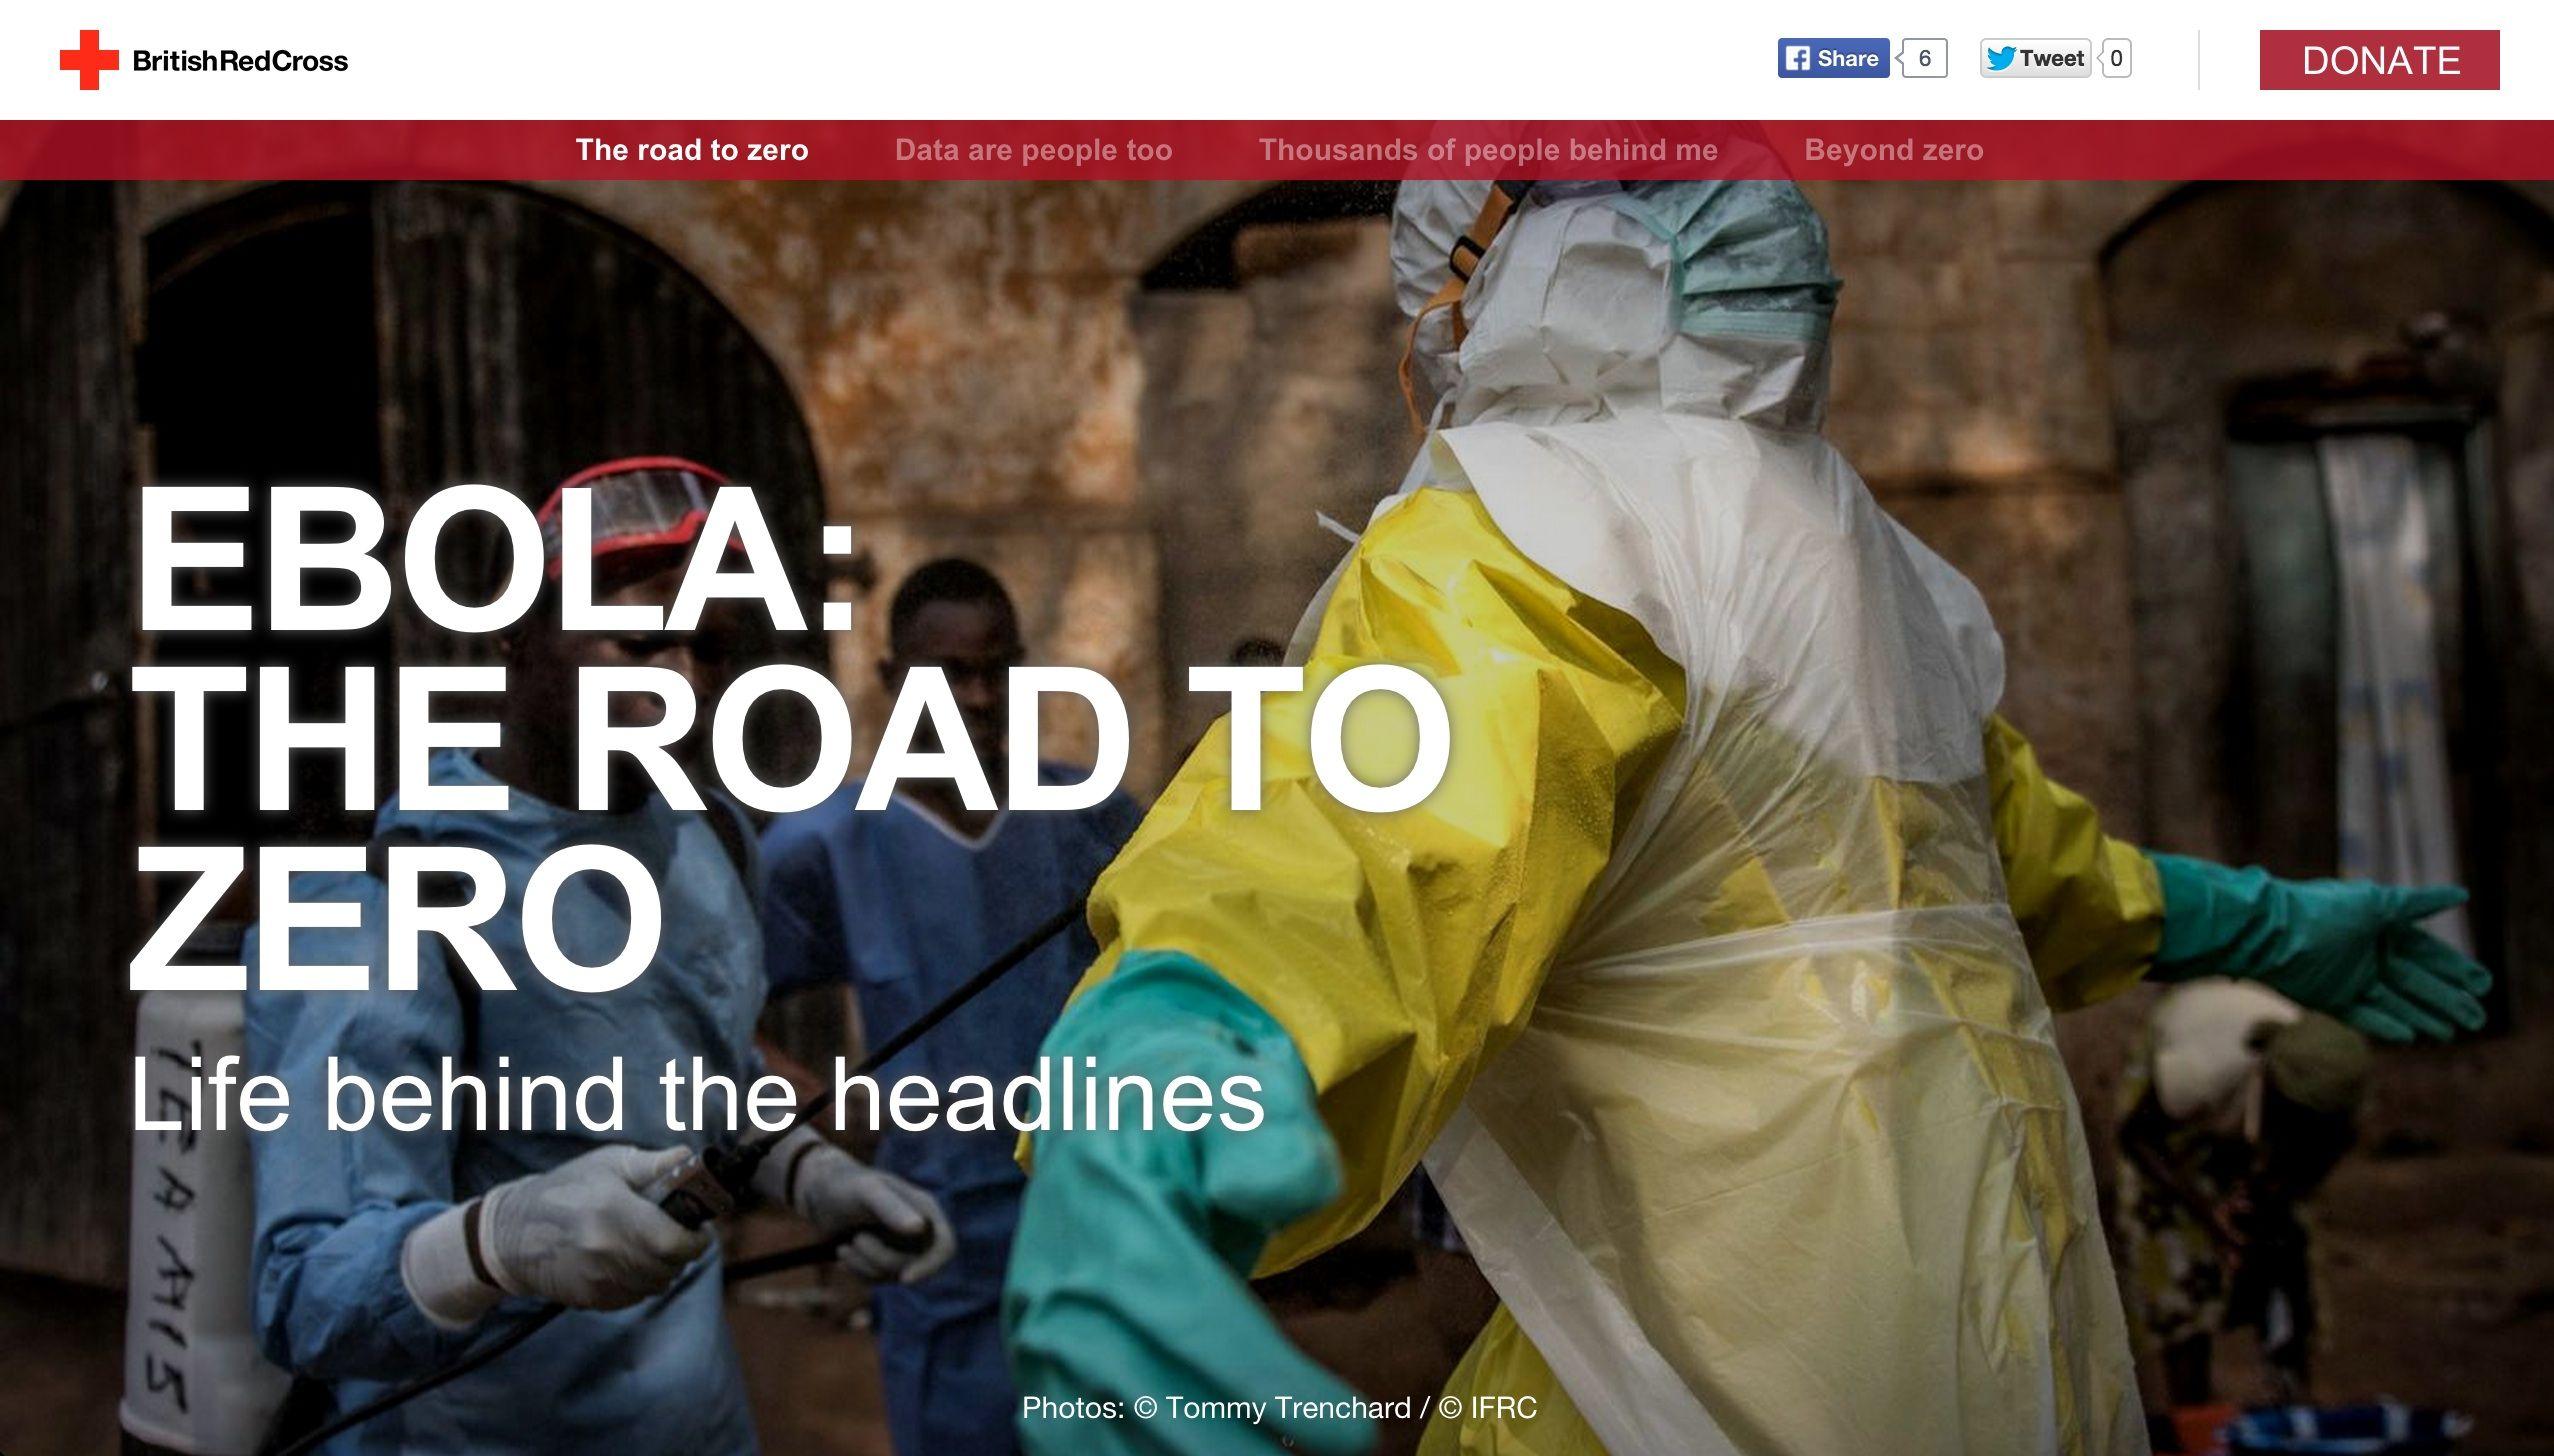 Ebola: The road to zero, British Red Cross